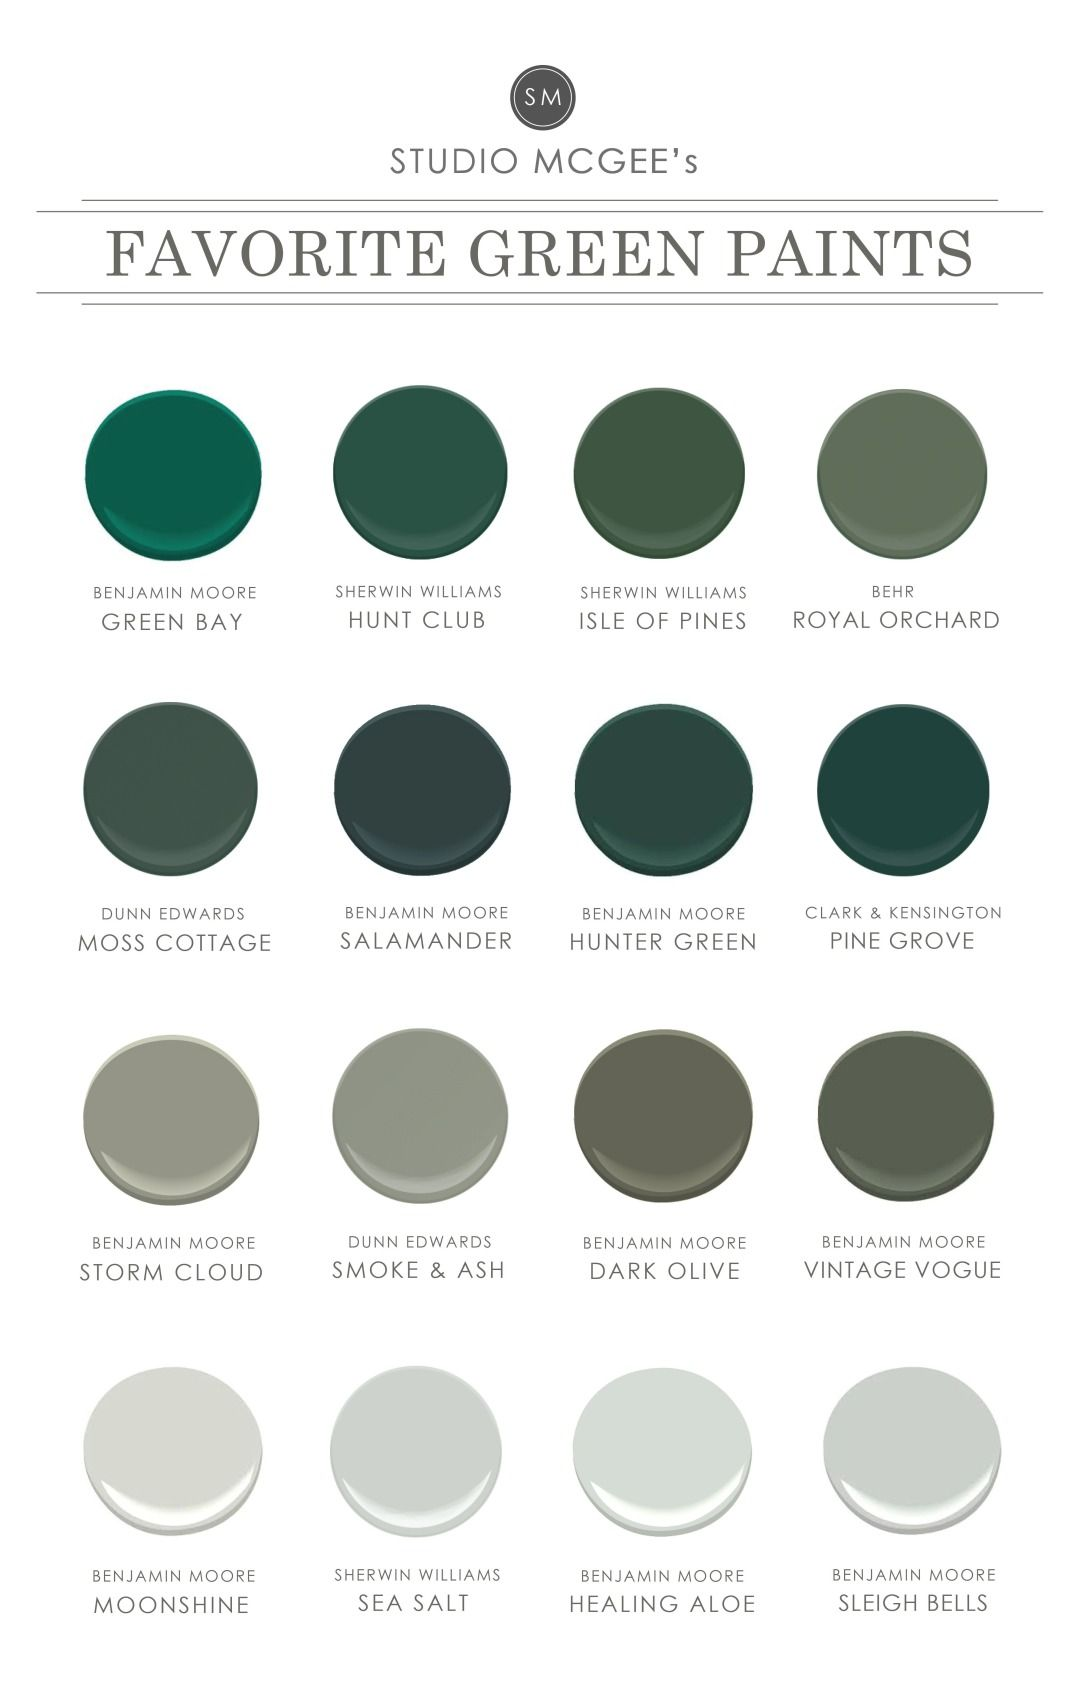 Best Emerald Green Paint Color : emerald, green, paint, color, We've, Rounded, Favorite, Green, Paint!, Benjamin, Moore, Green,, Paint, Colors,, Colors